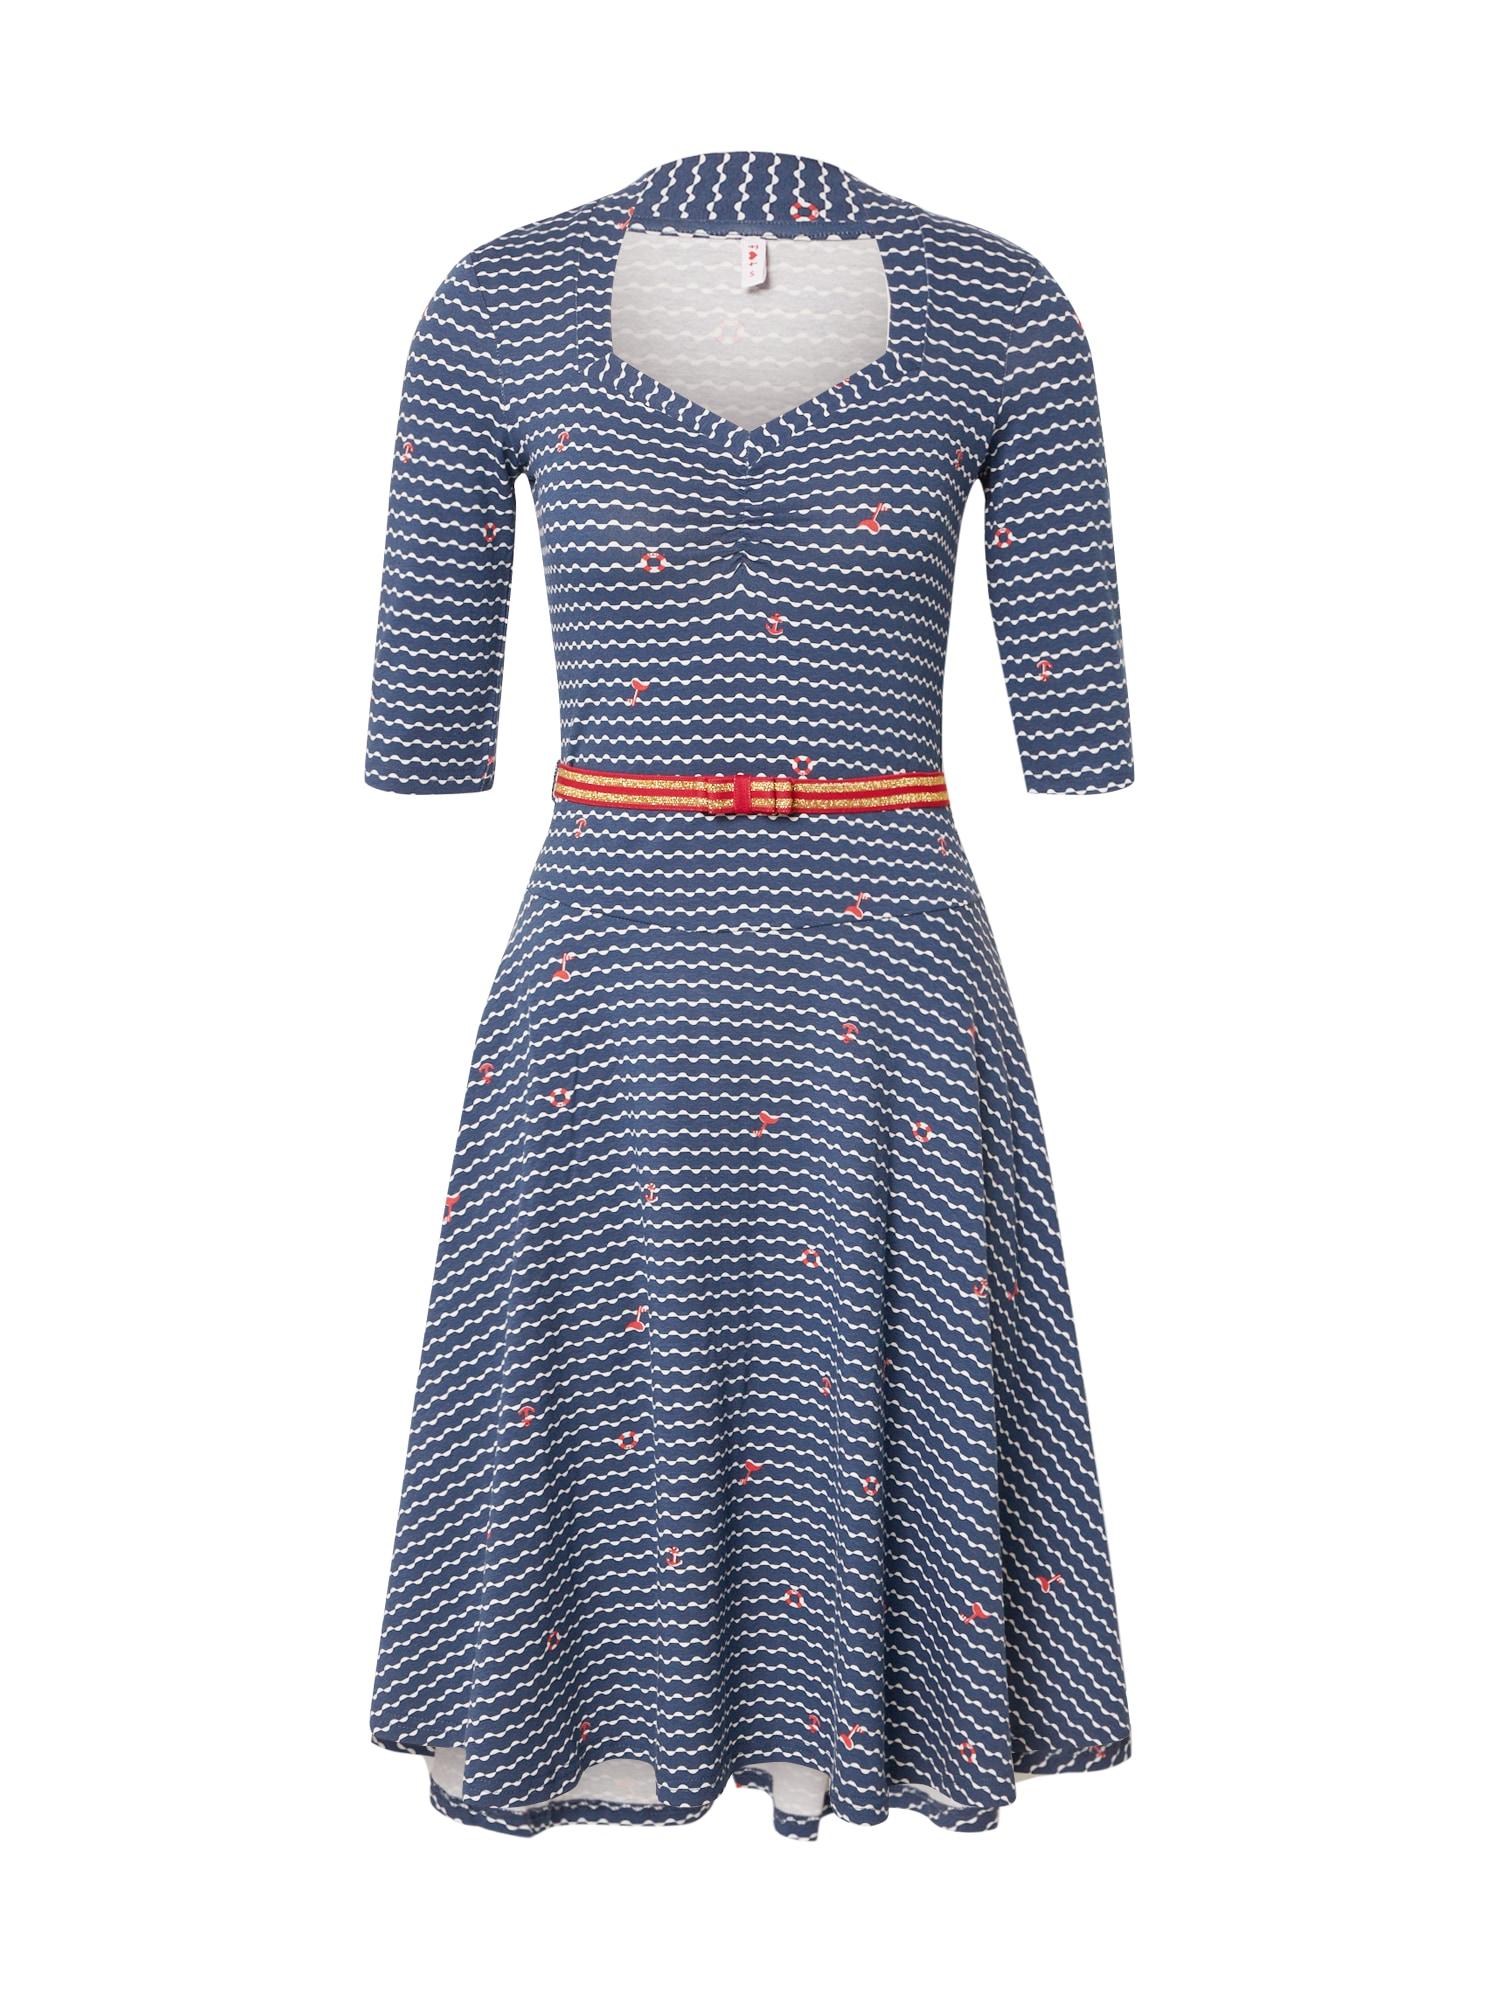 Blutsgeschwister Vakarinė suknelė 'suzie the snake dress' mėlyna